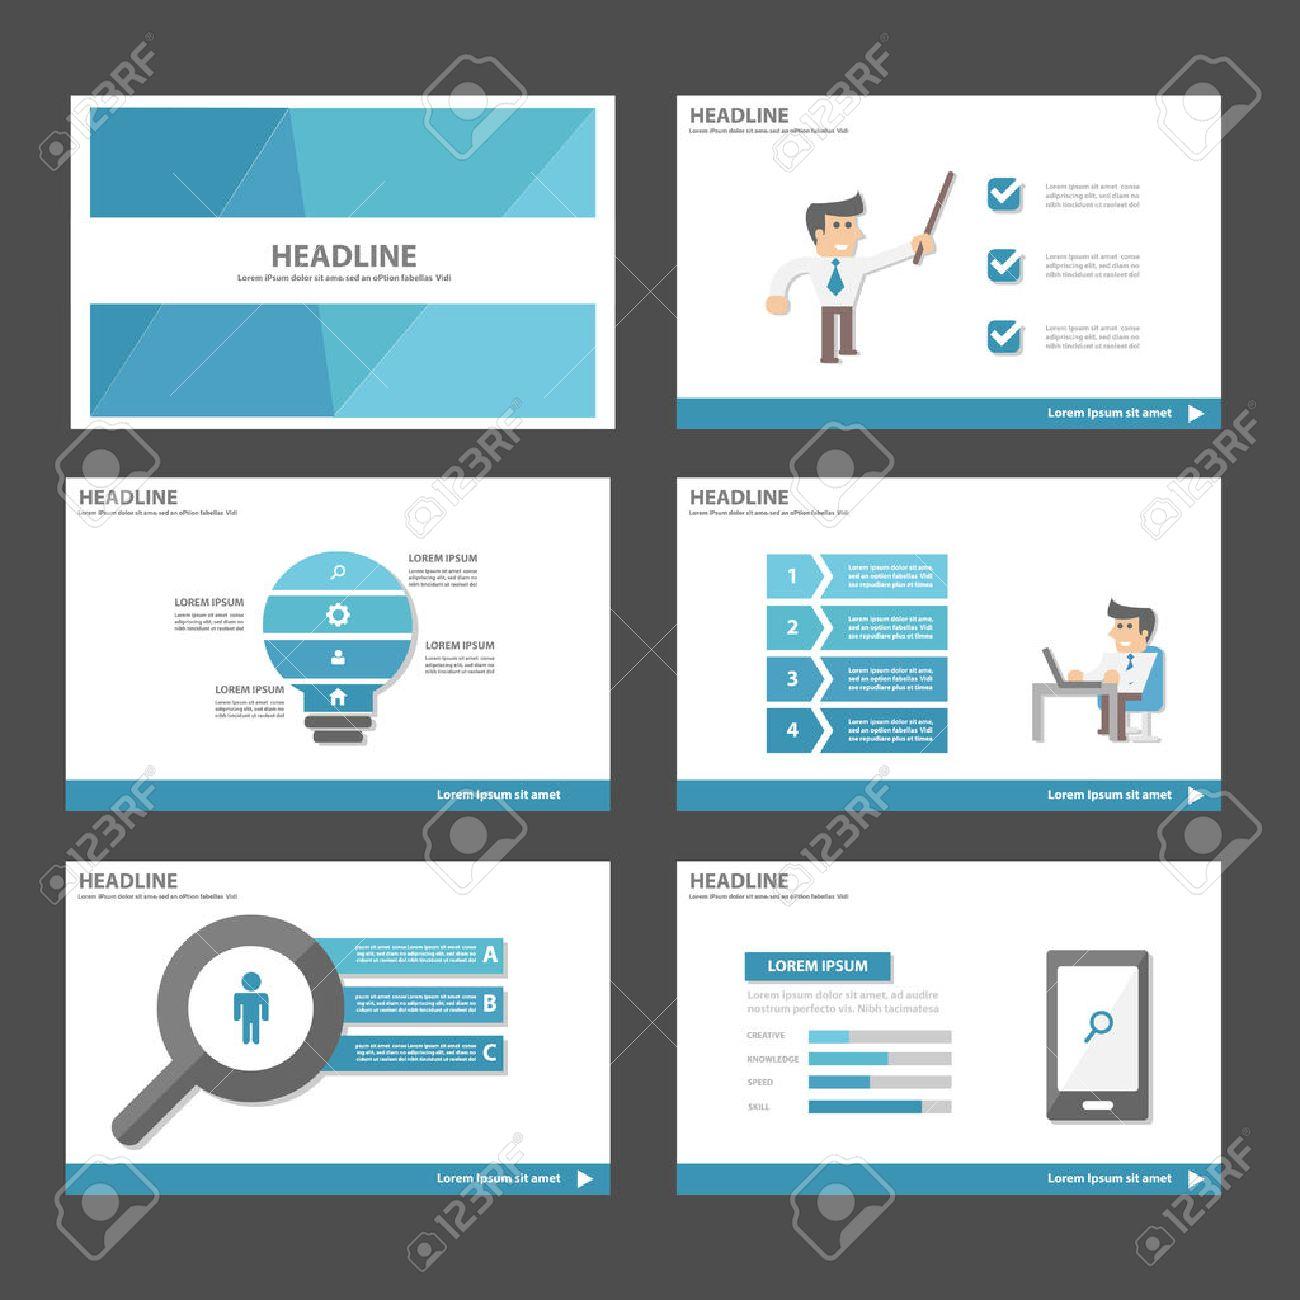 businessman blue theme multipurpose infographic elements and businessman blue theme multipurpose infographic elements and icon presentation template flat design set for advertising marketing